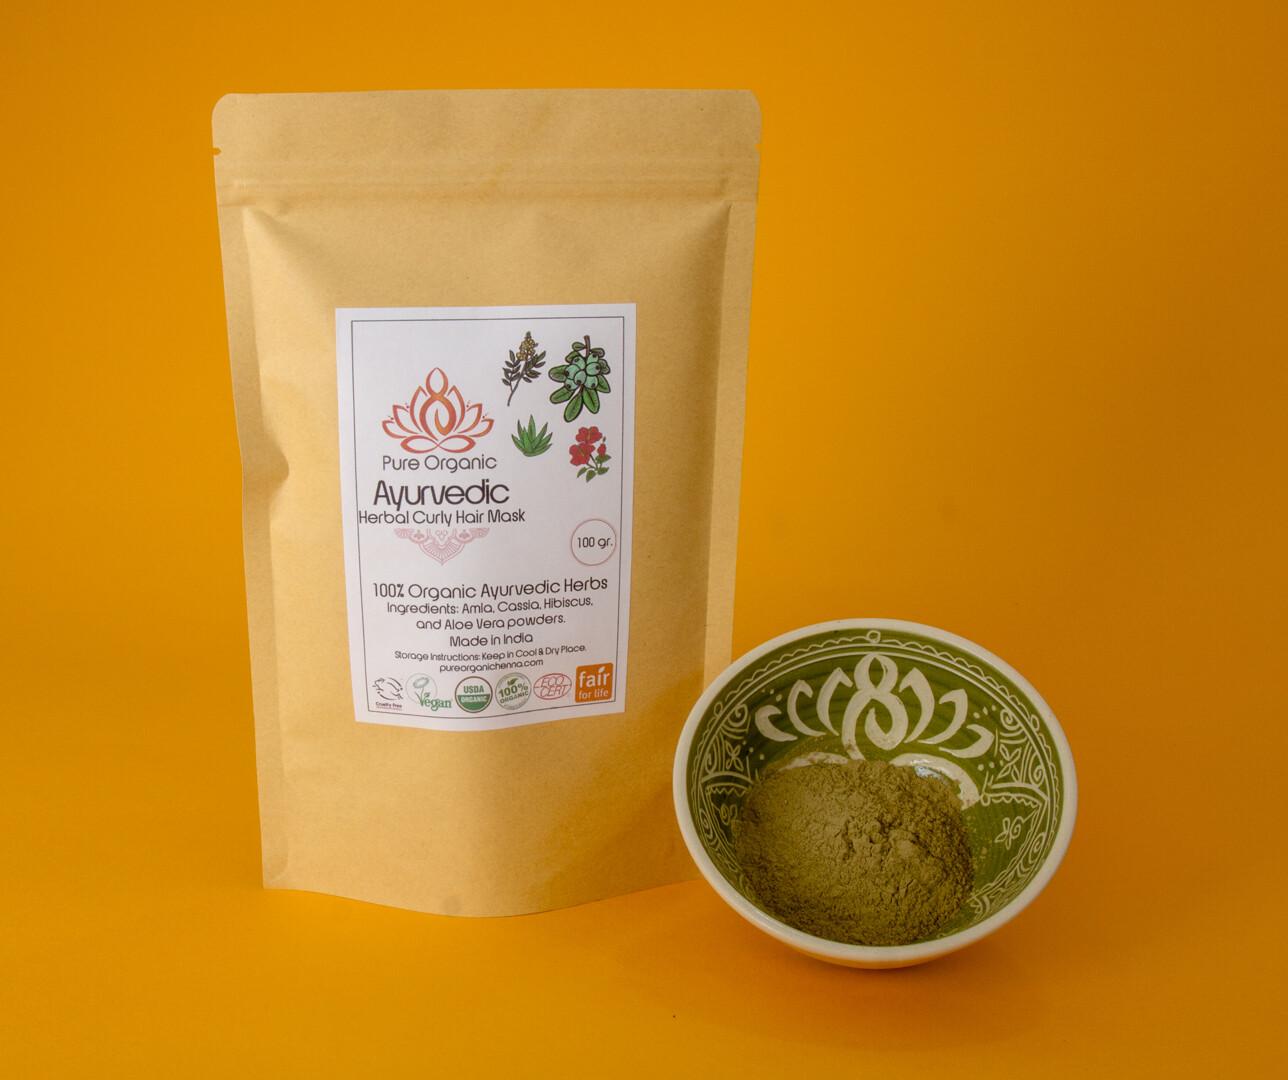 Pure Organic Ayurvedic Herbal Curly Hair Mask